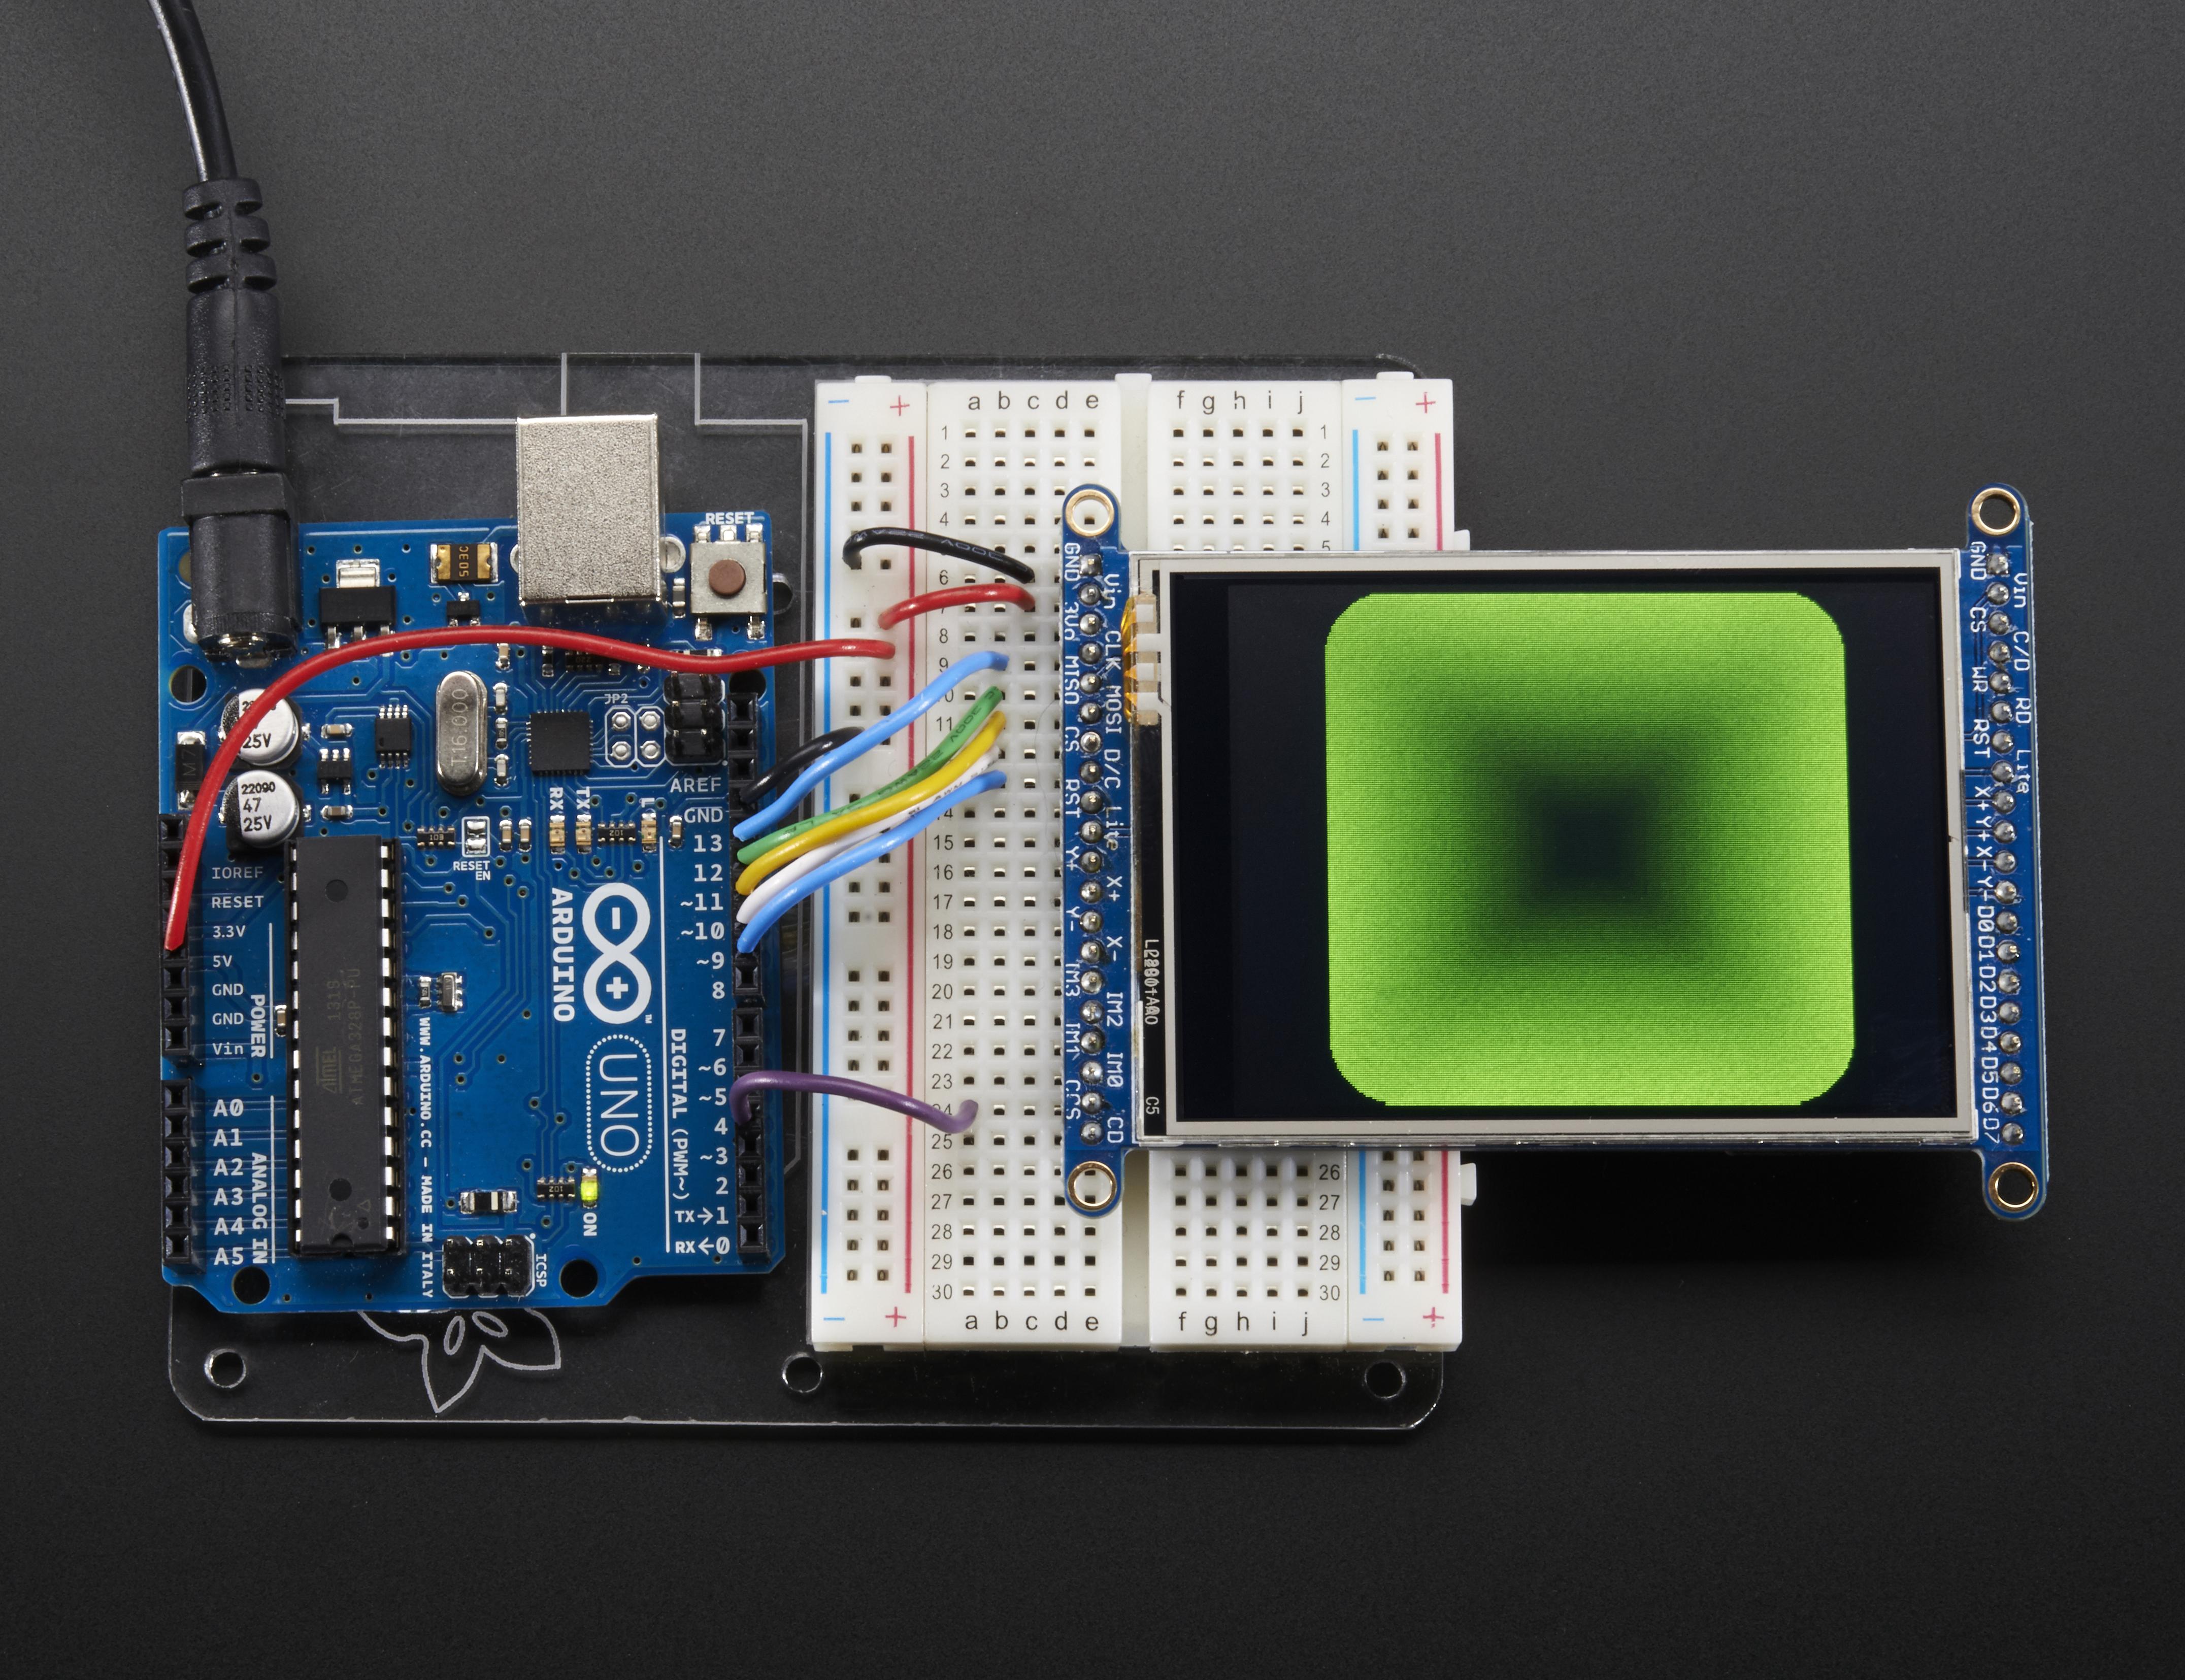 adafruit_products_Touchscreen_display_Green_box_01_ORIG.jpg